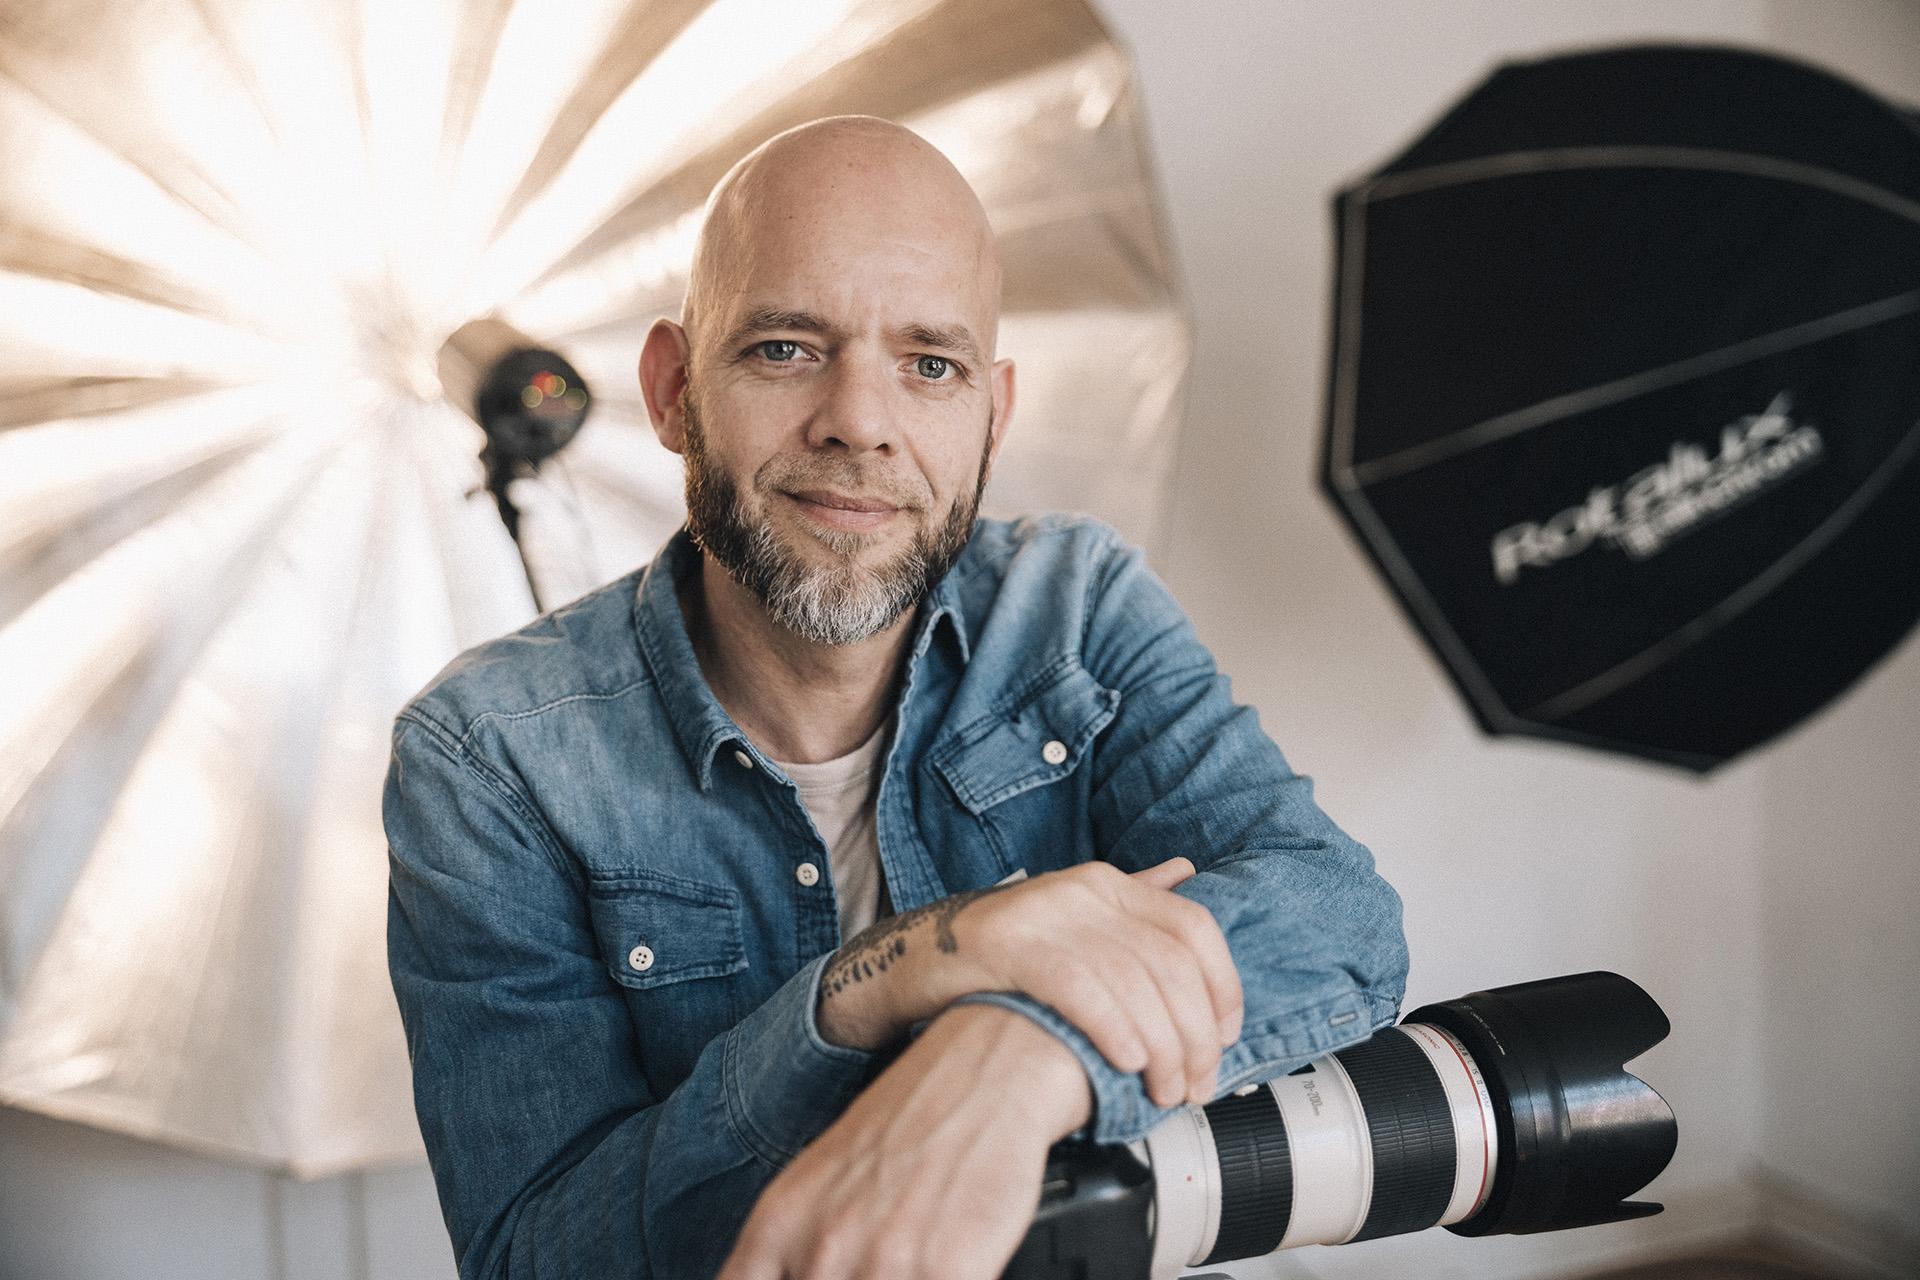 Mario Schmitt, Fotograf